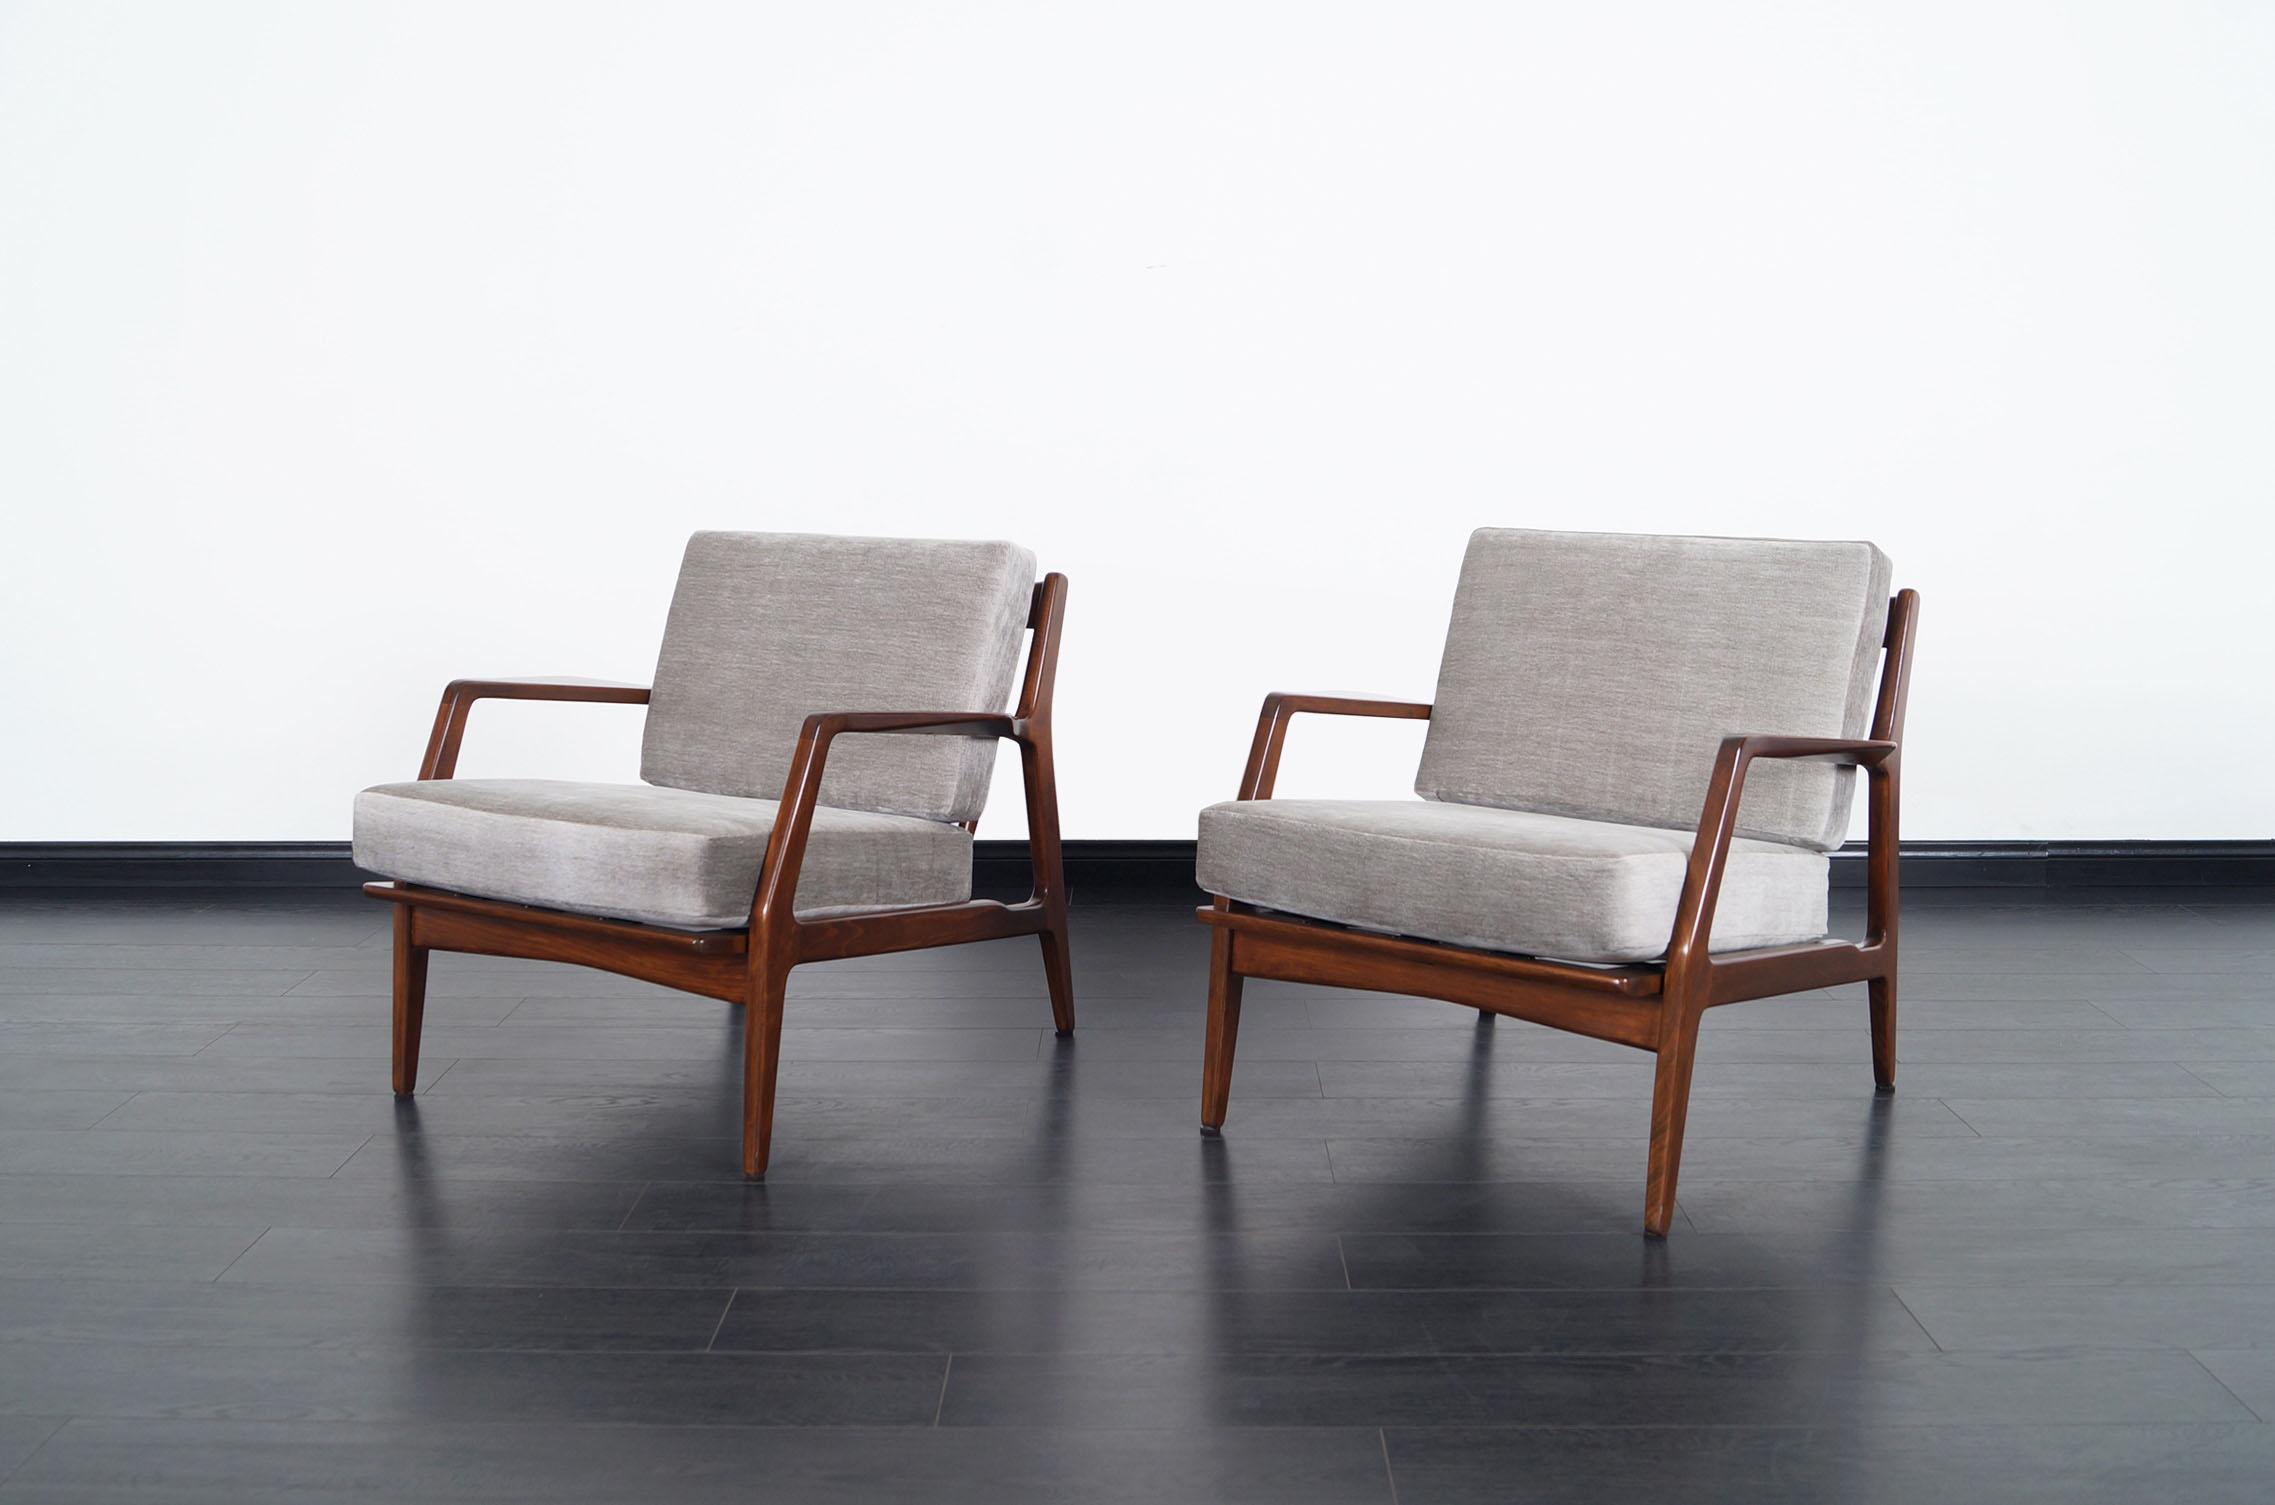 Mid Century Modern Lounge Chairs by Ib Kofod Larsen